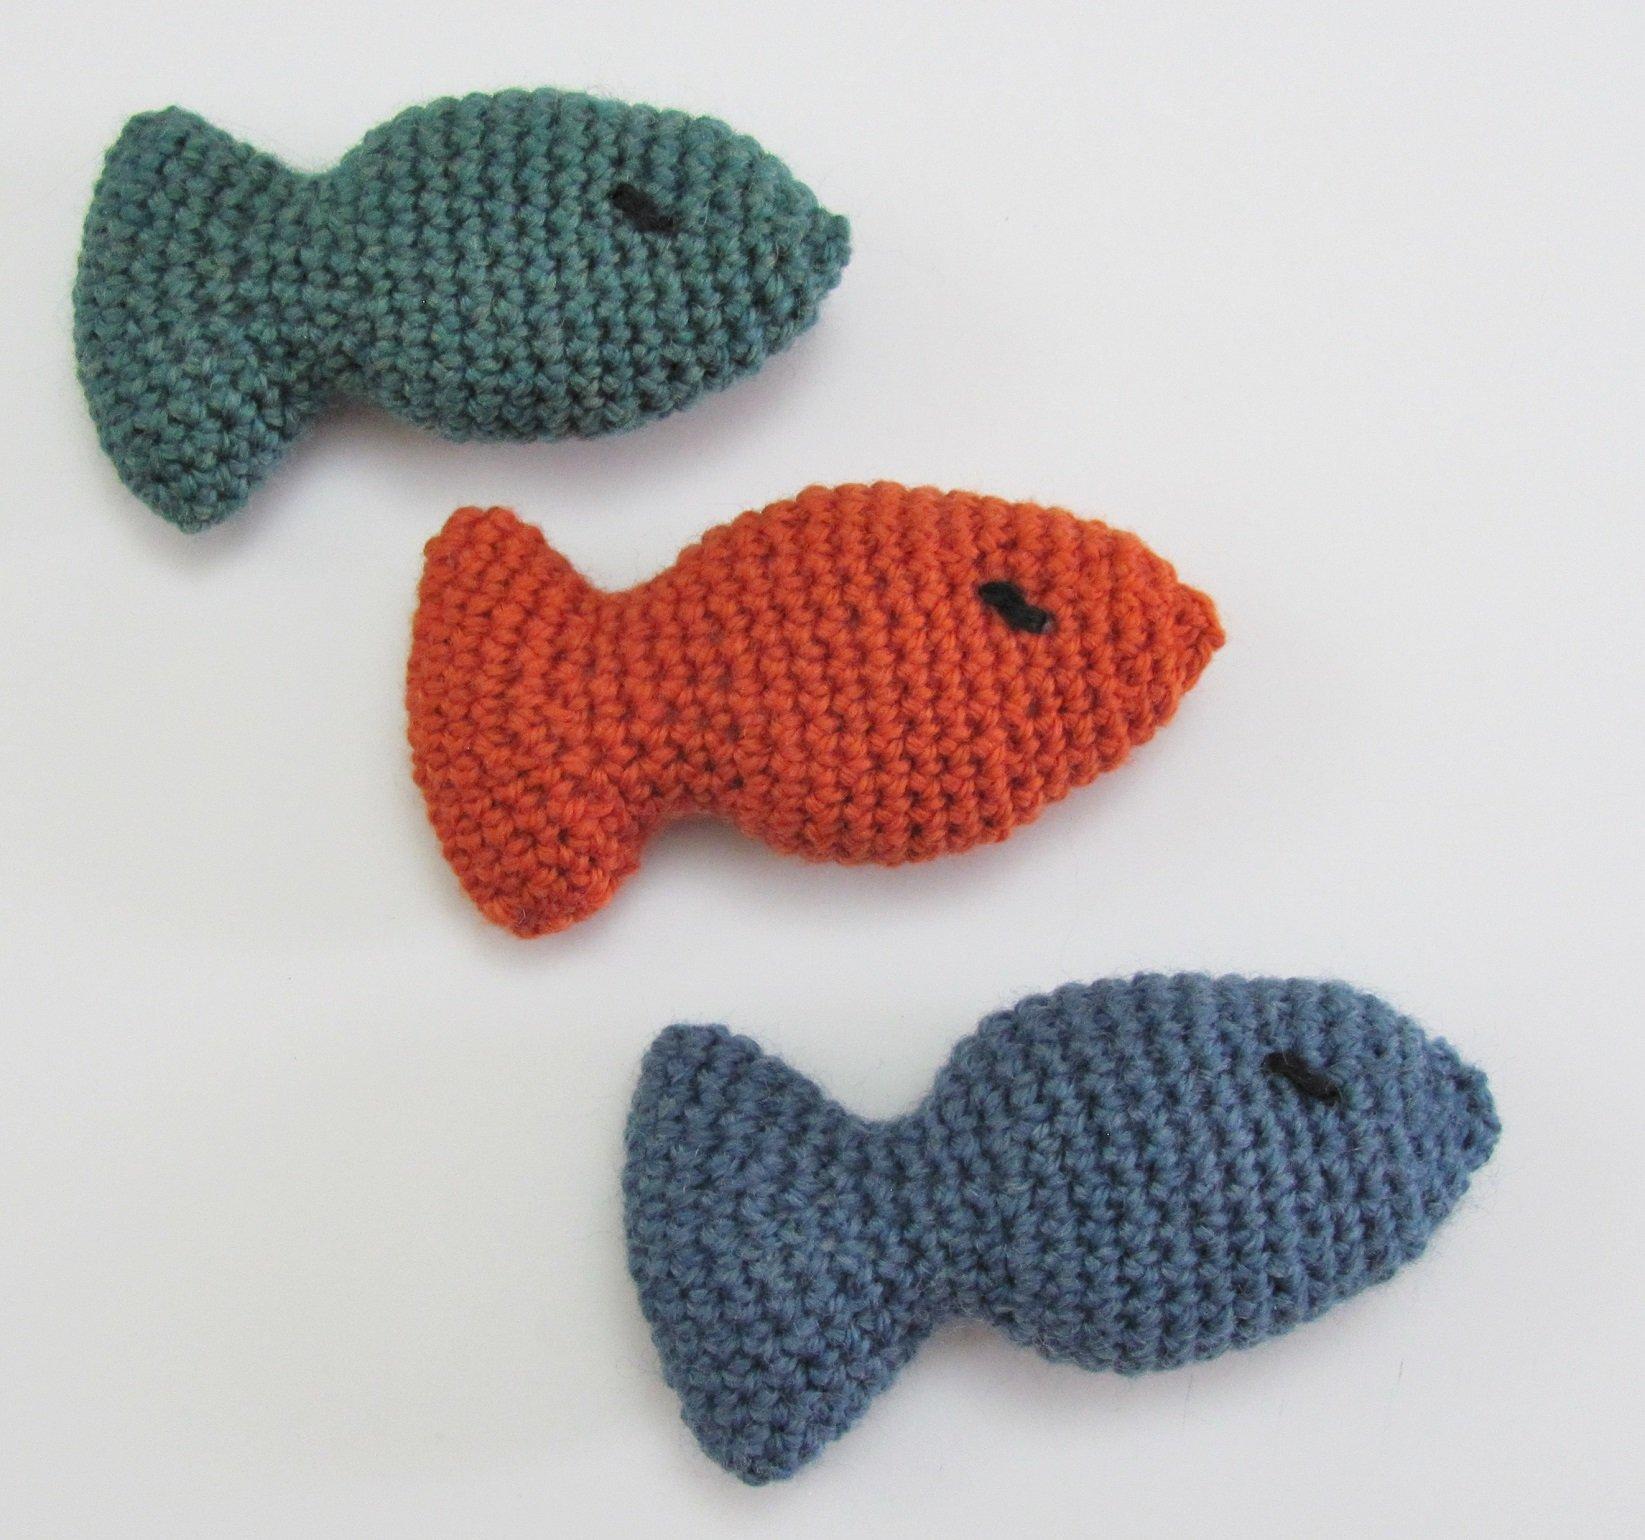 Handmade Cat Toy Fish, Choose Stuffed with Organic Catnip or No Catnip Added